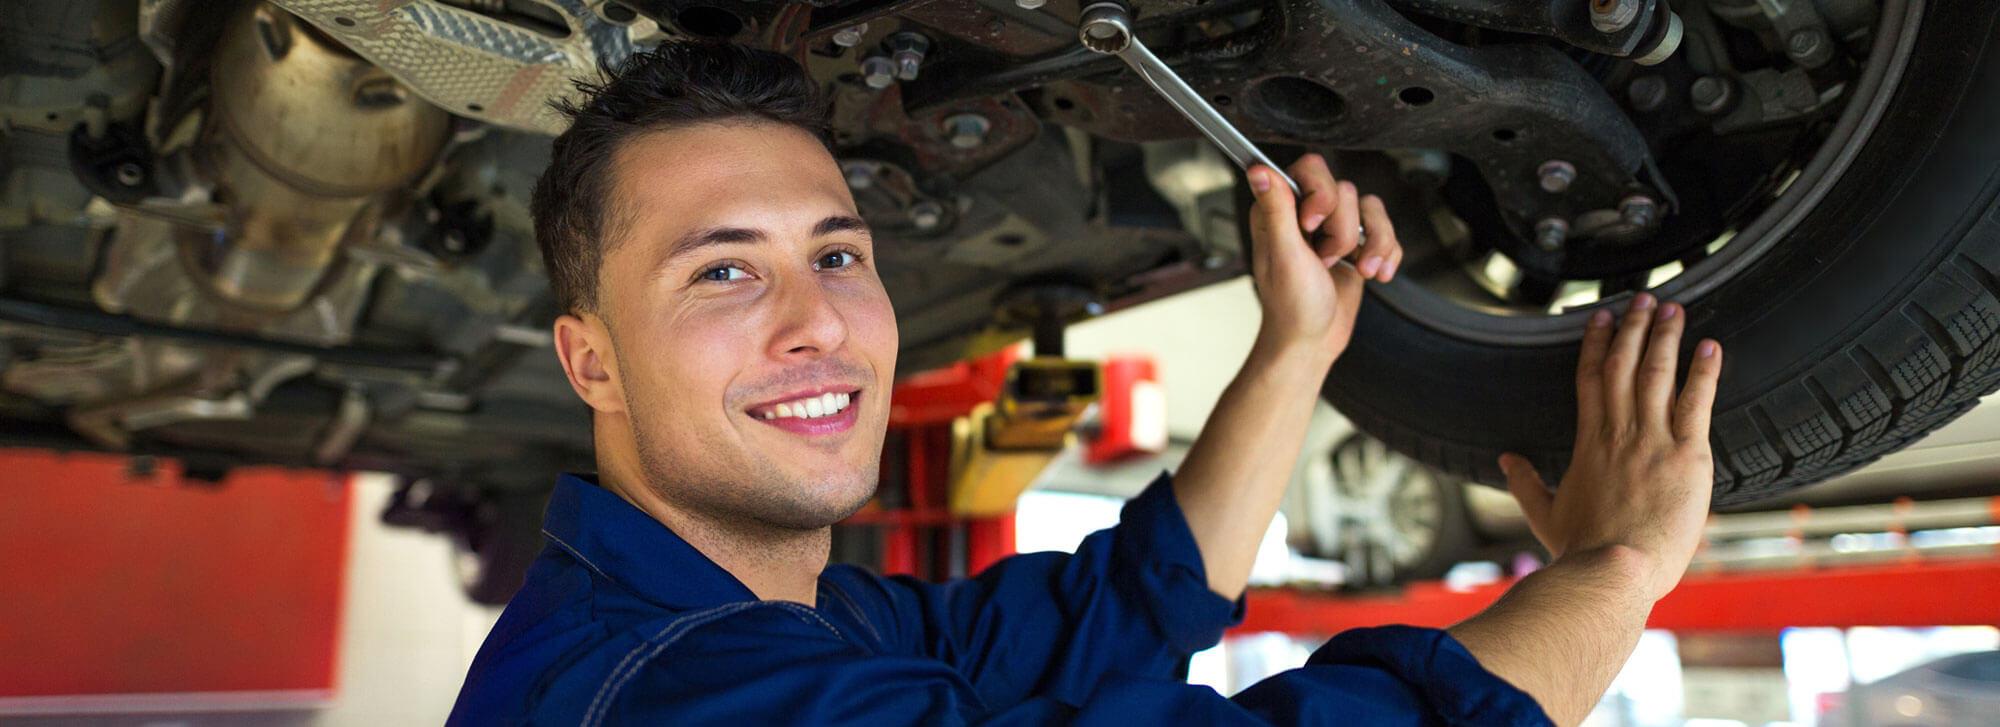 Brakes & Clutch Equipment Wholesalers & Manufacturers